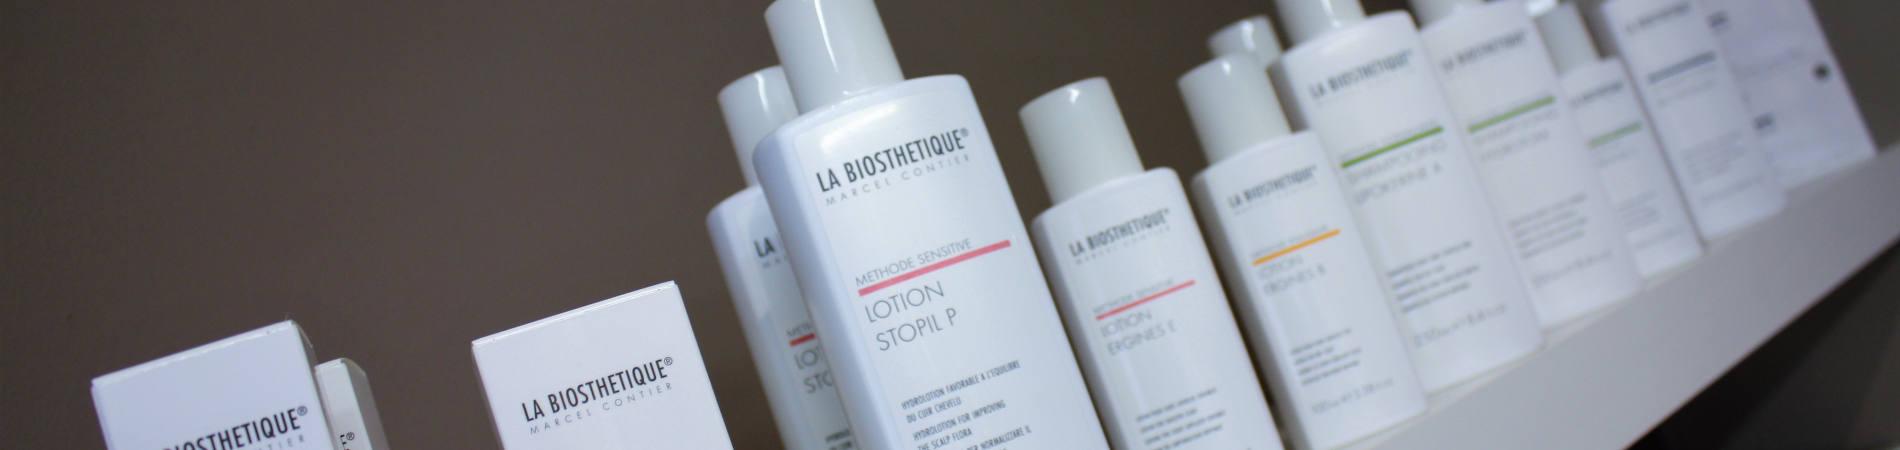 La Biosthetique hair loss products